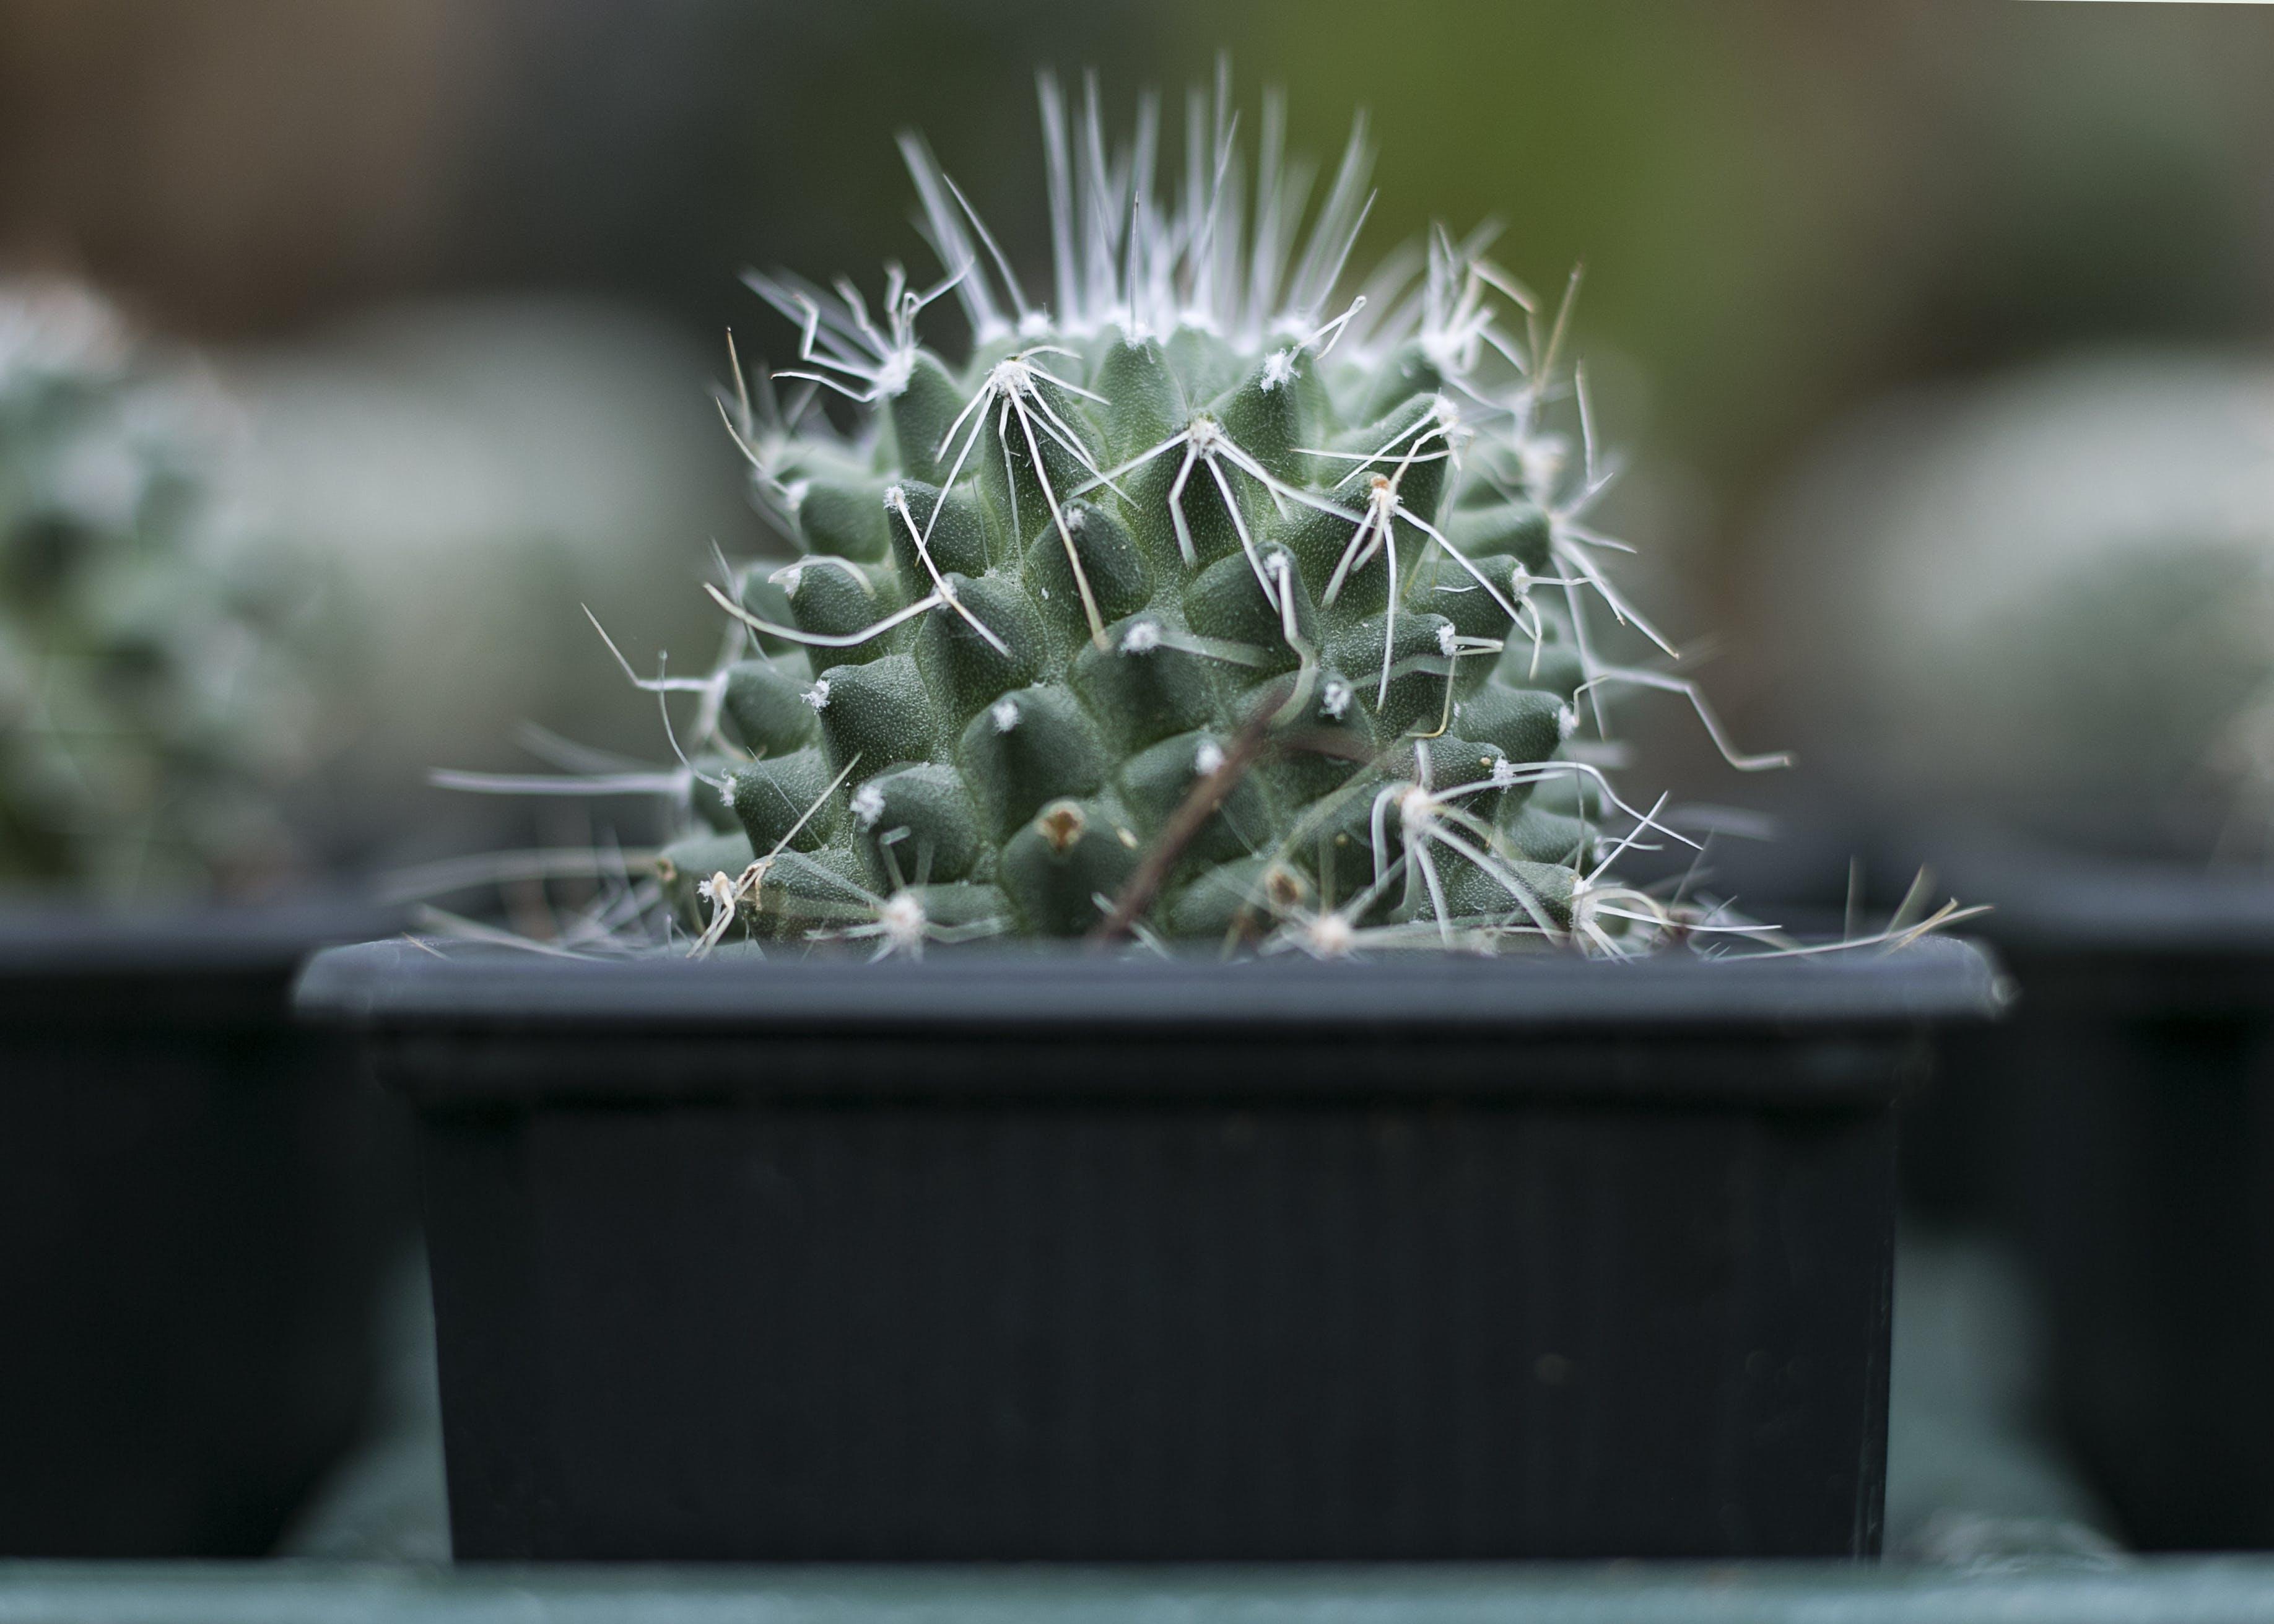 Selective Focus Photograph of Cactus Plant on Black Pot